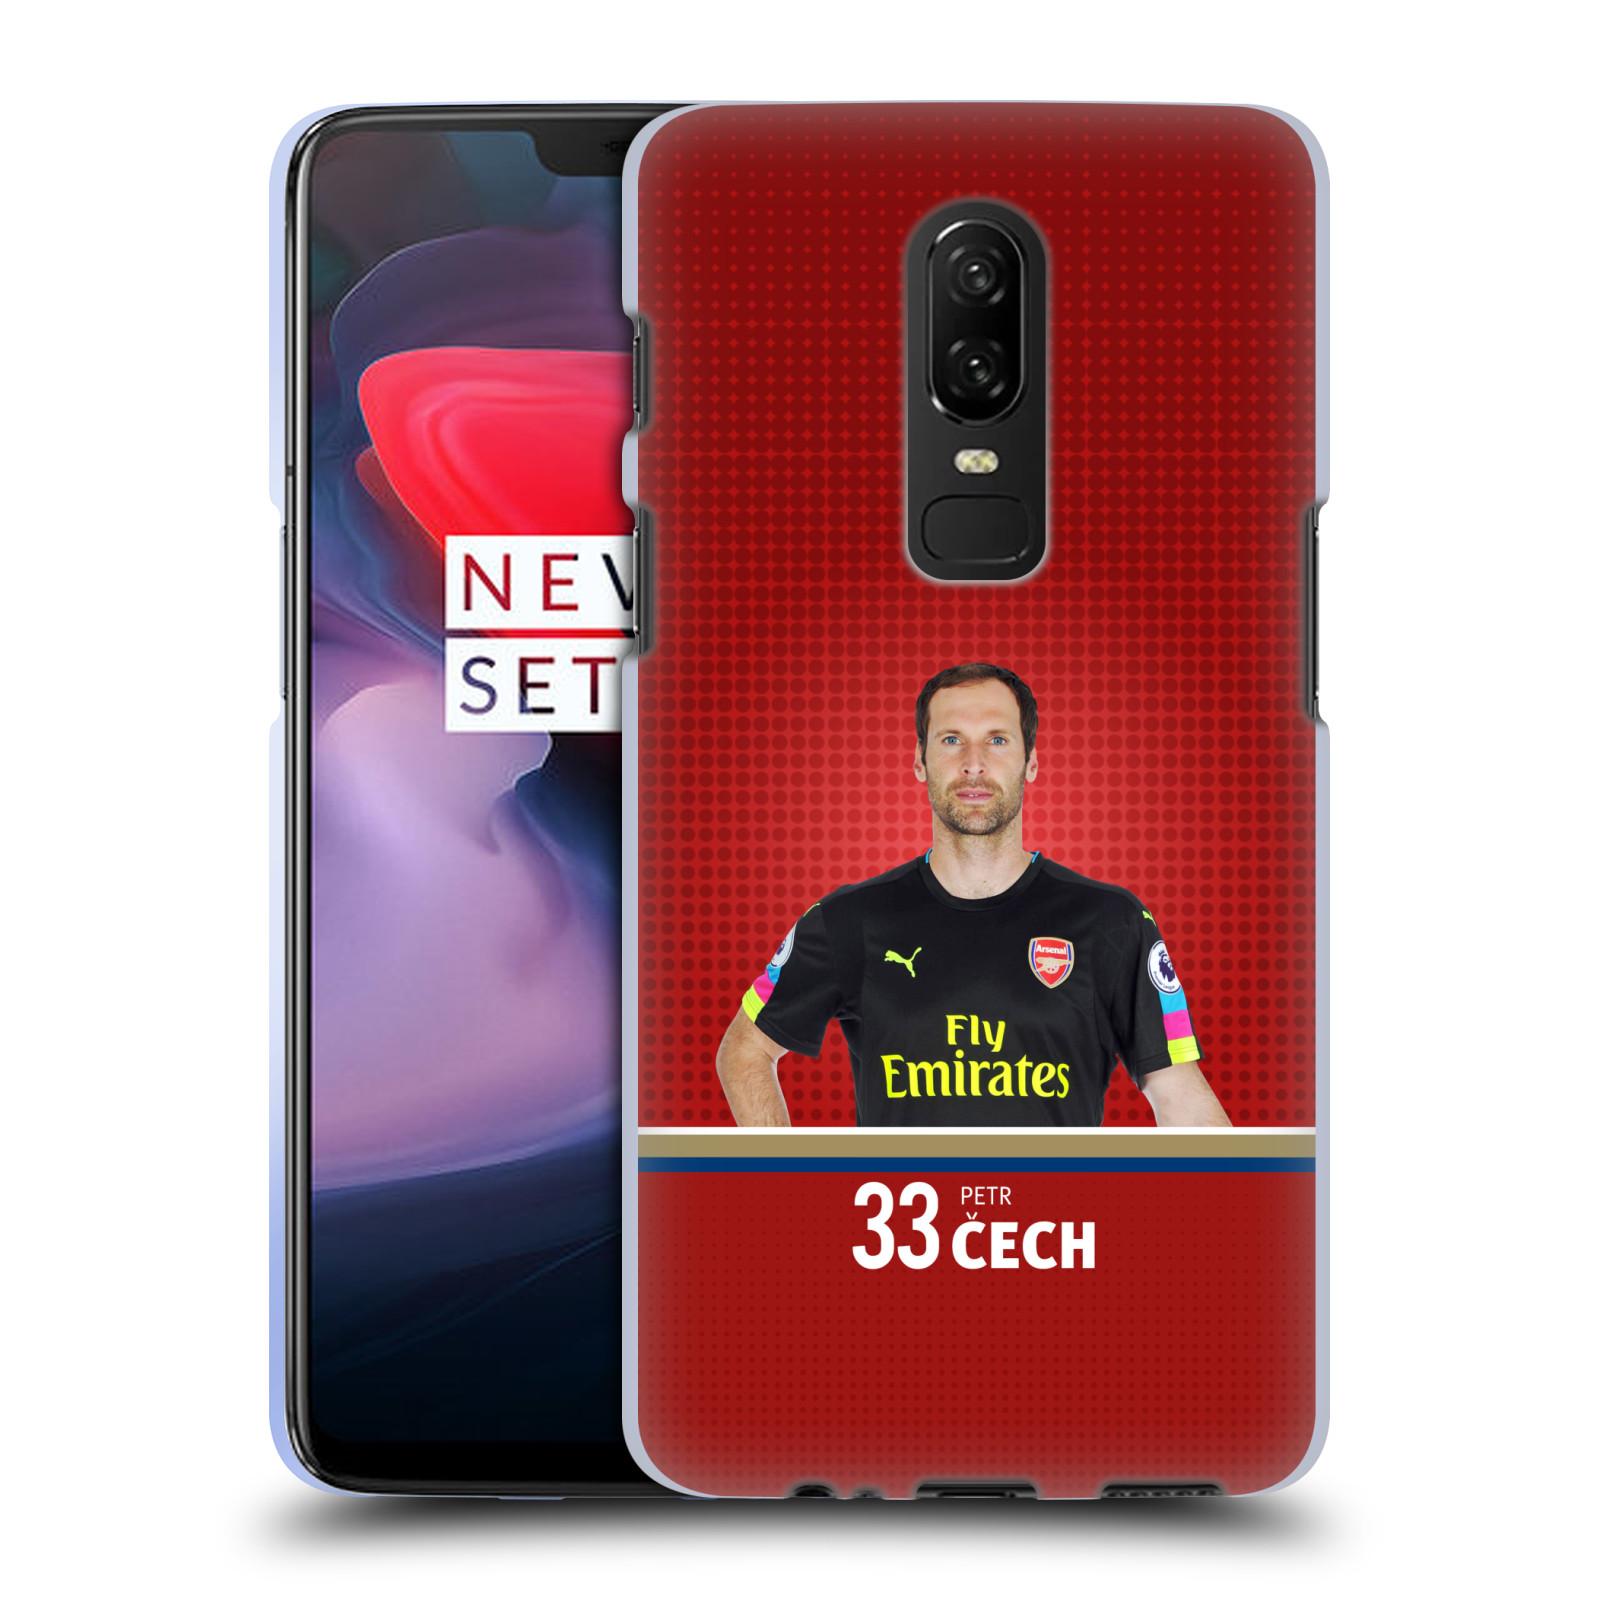 Silikonové pouzdro na mobil OnePlus 6 - Head Case - Arsenal FC - Petr Čech